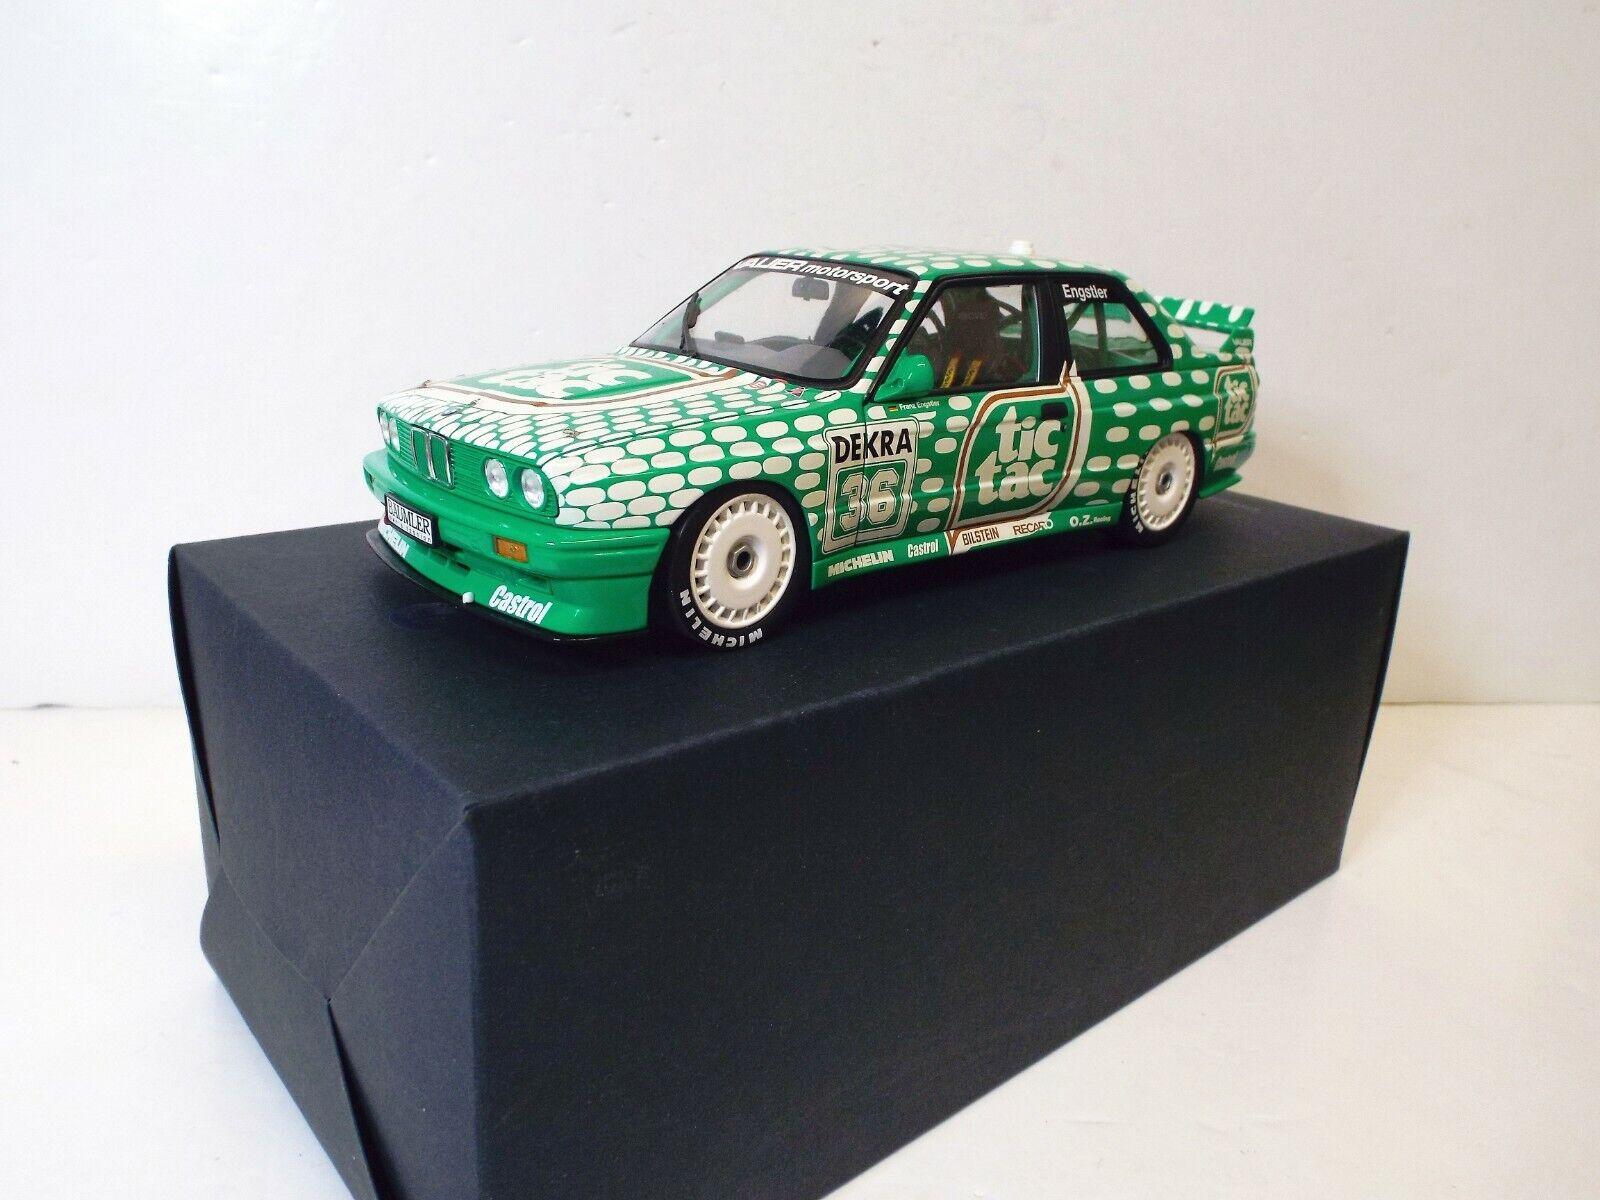 1 18 Minichamps concesionario BMW modelo E30 M3 Tic Tac Touring Car 1992 MIB (1 18 126)